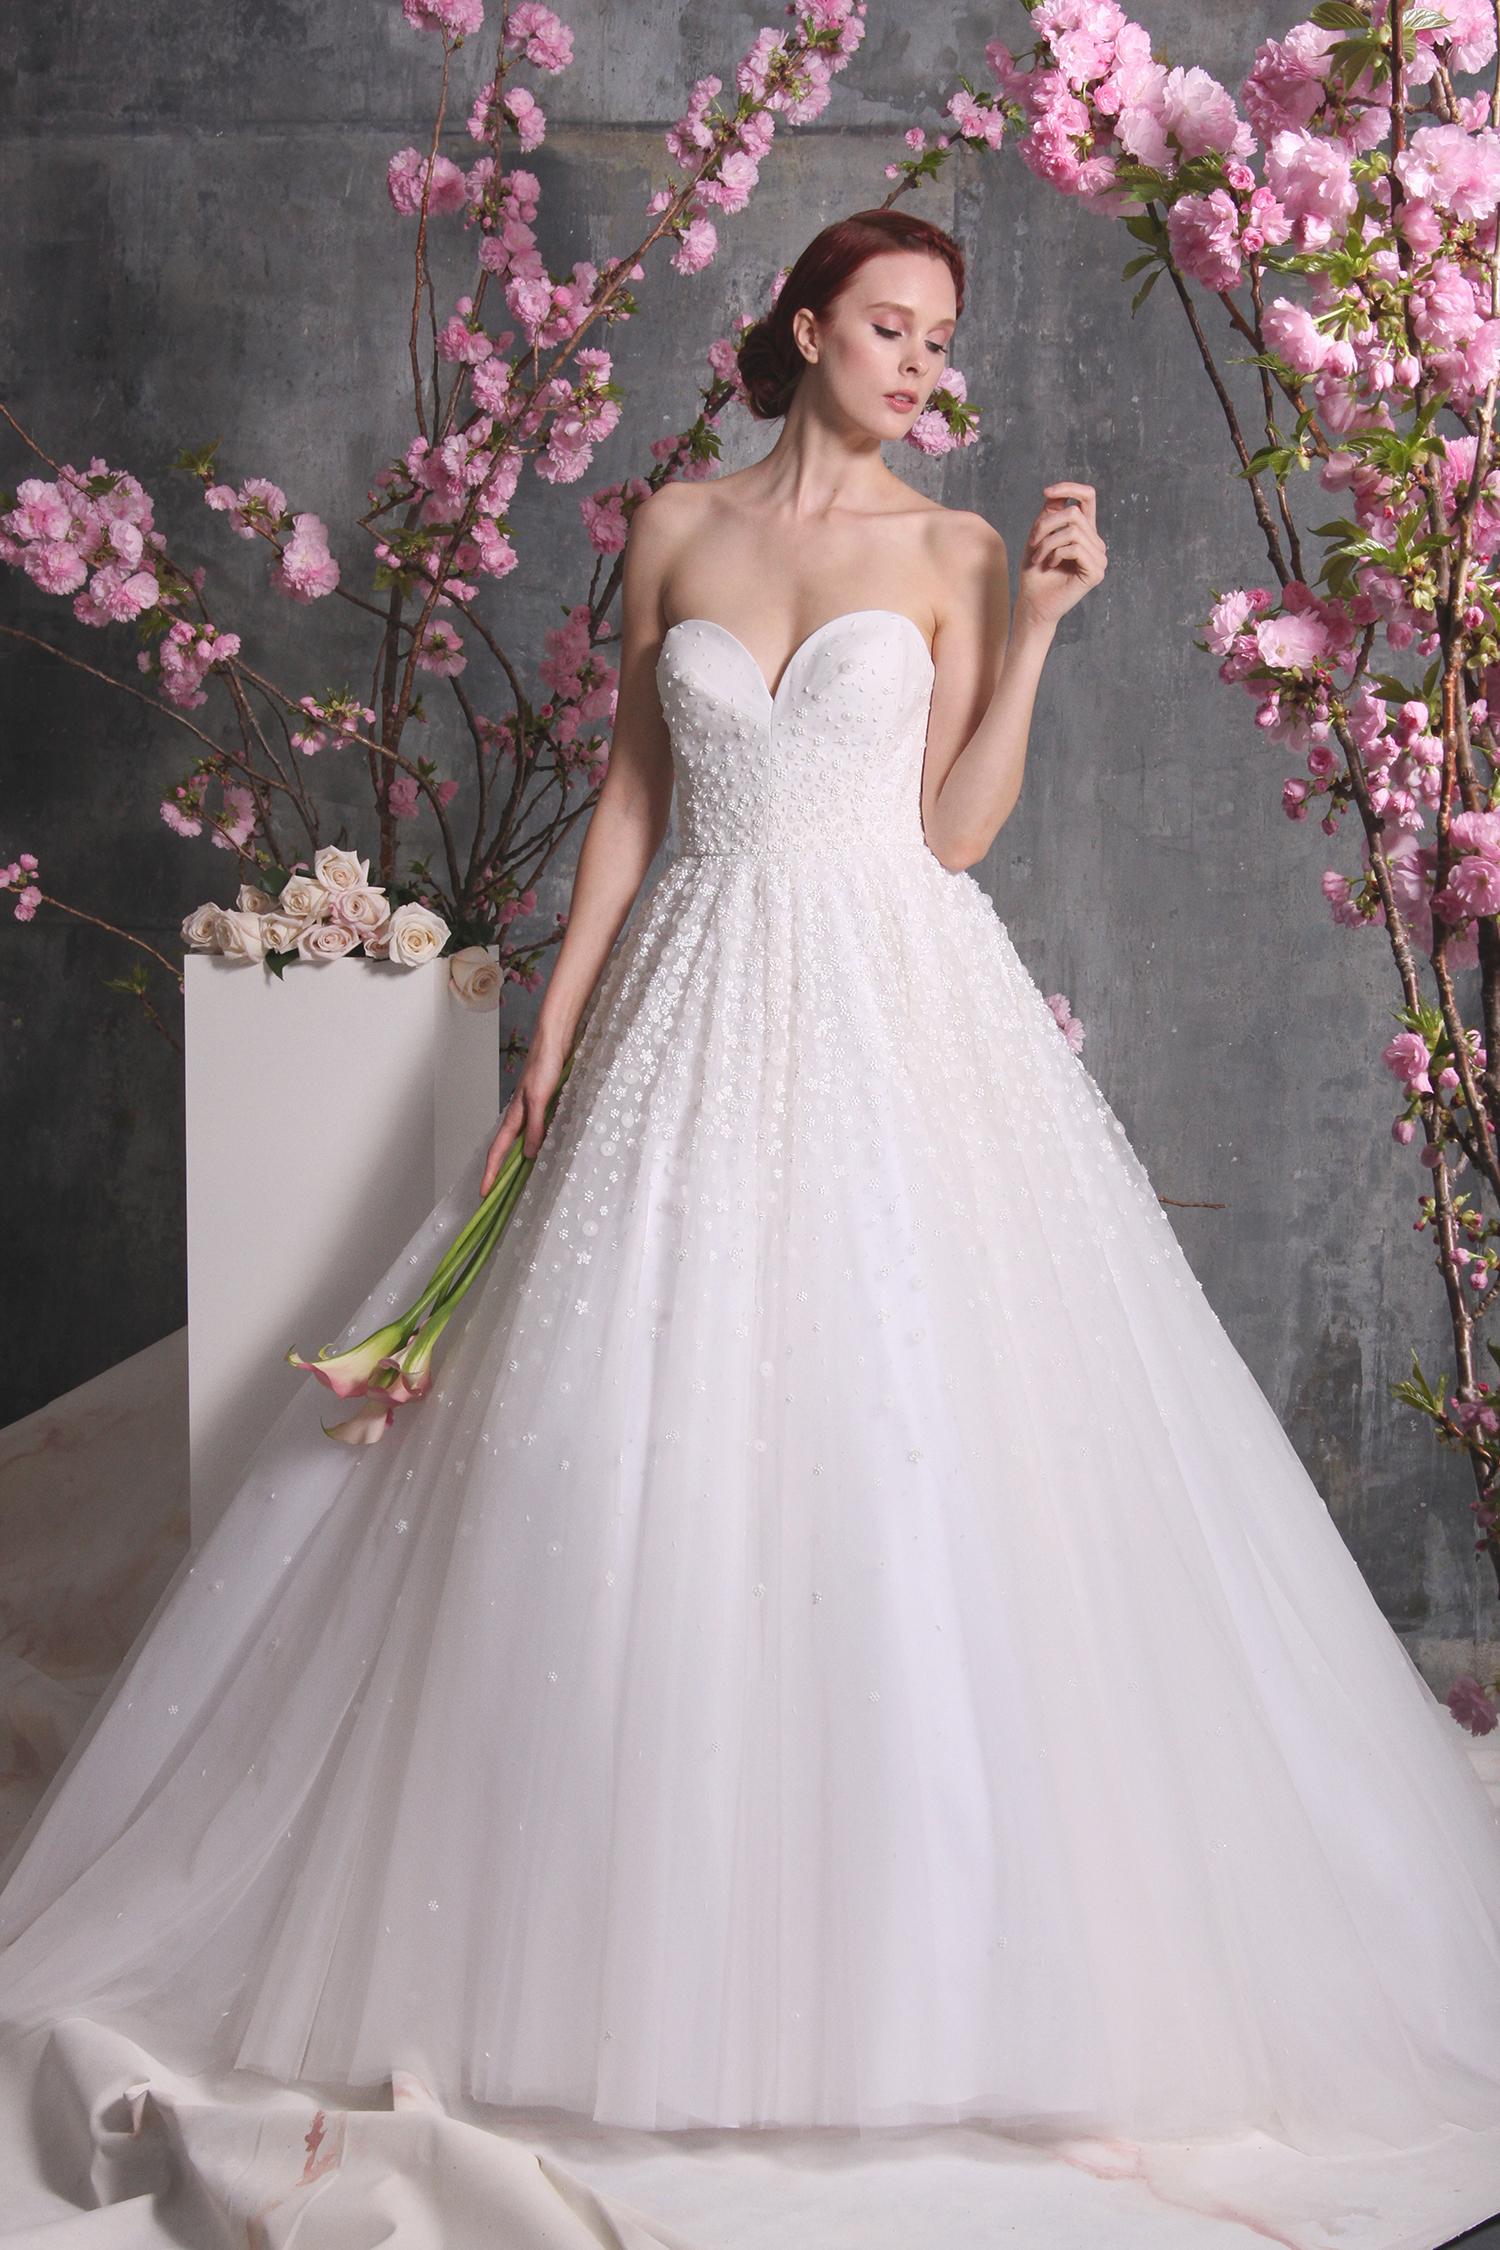 christian siriano dress spring 2018 sweetheart a-line